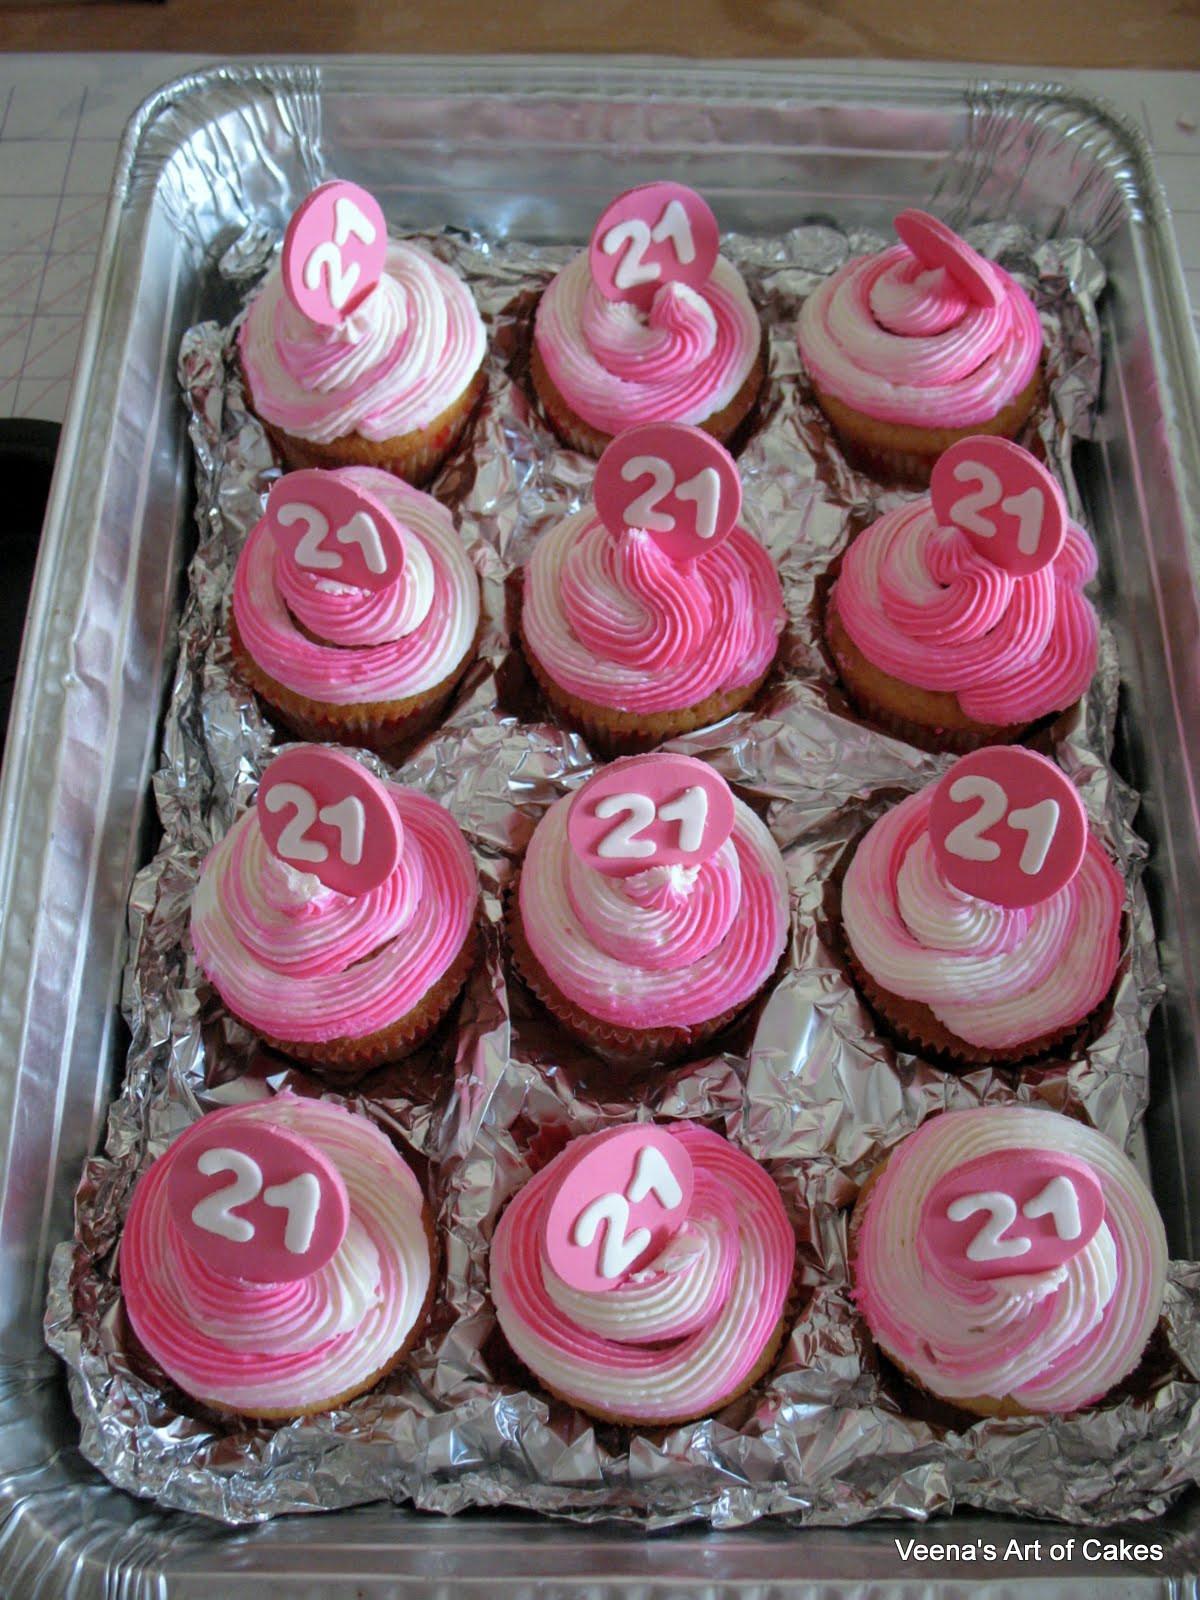 How To Transport Cupcakes  How to transport Cupcakes Veena Azmanov